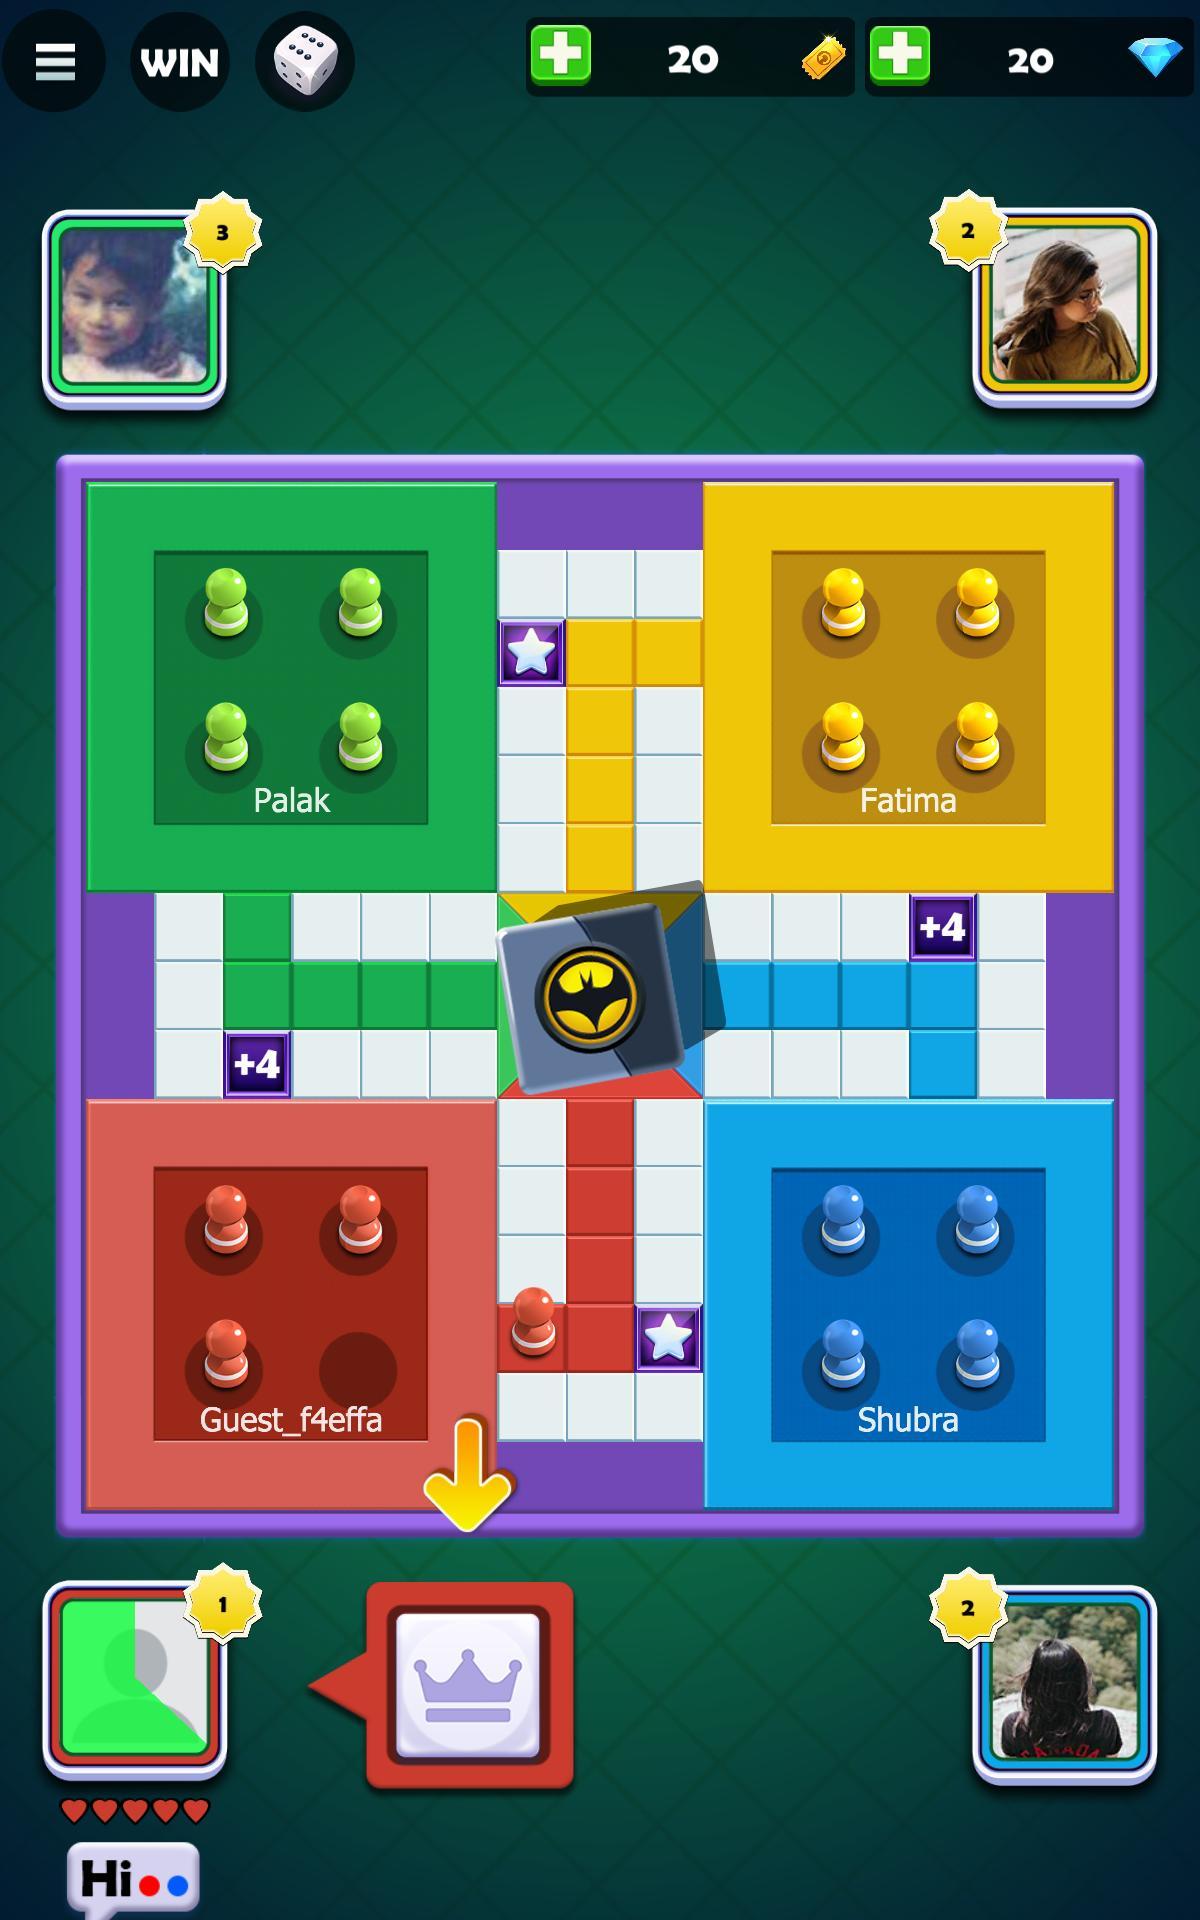 Ludo Game : Super Ludo For Android - Apk Download concernant France 4 Ludo